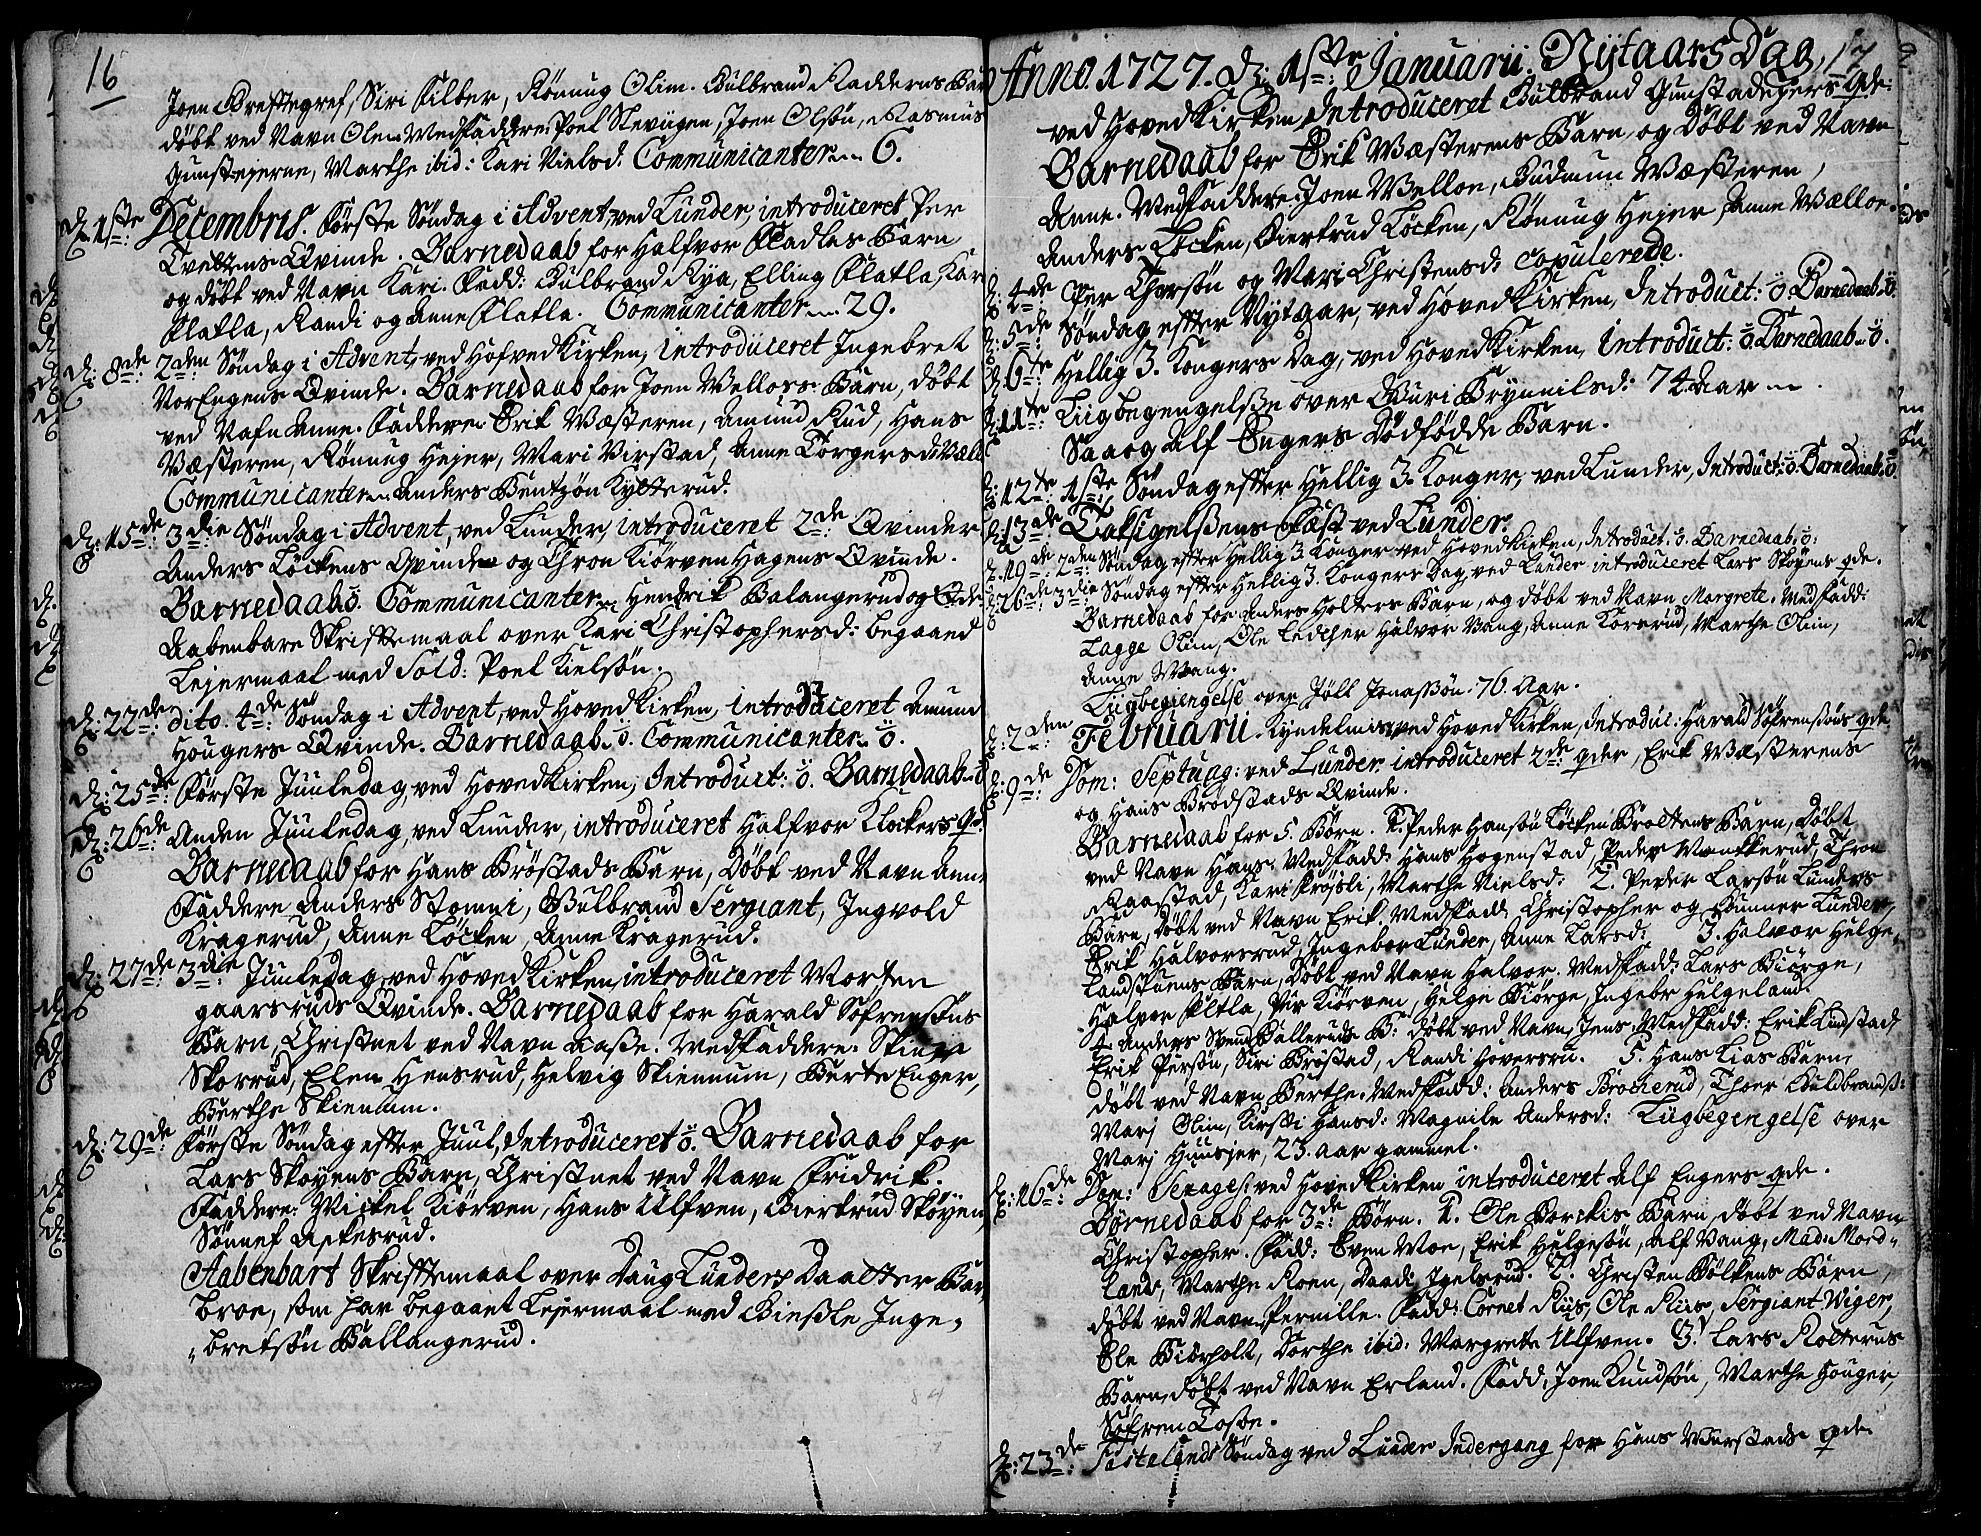 SAH, Jevnaker prestekontor, Ministerialbok nr. 2, 1725-1751, s. 16-17